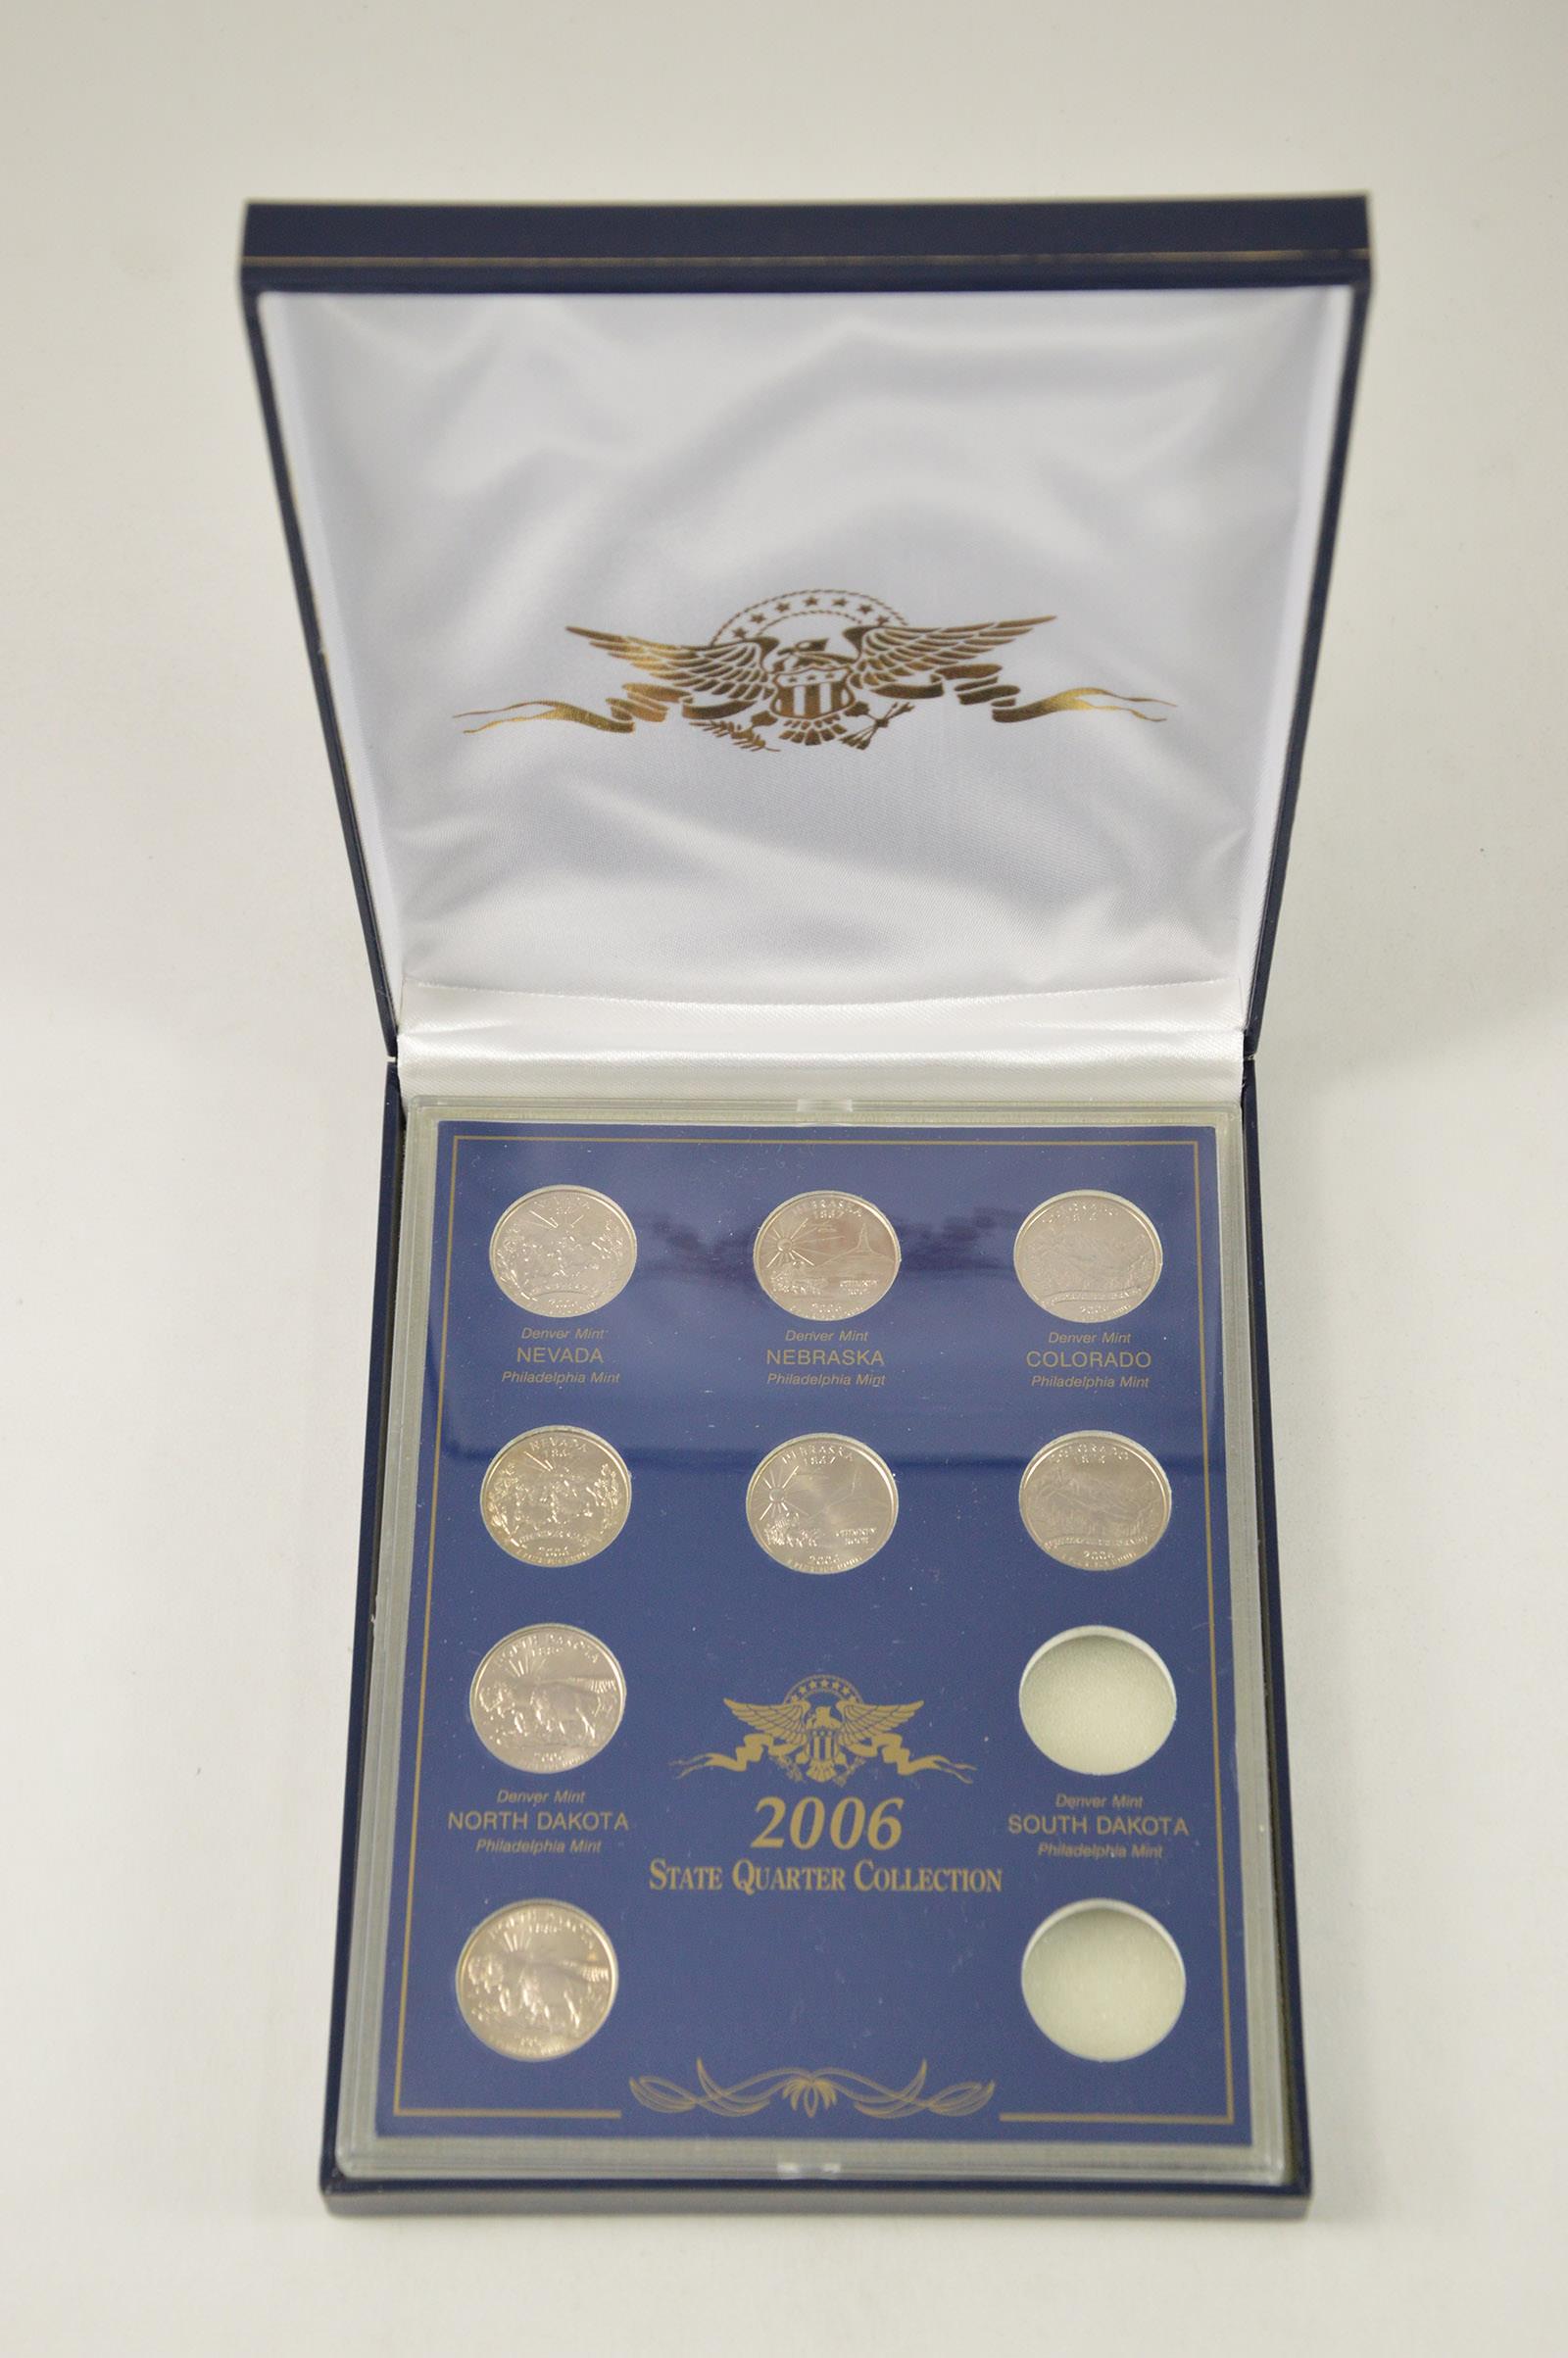 2006 P NEBRASKA COIN /& DIE SET WITH BOX AND COA